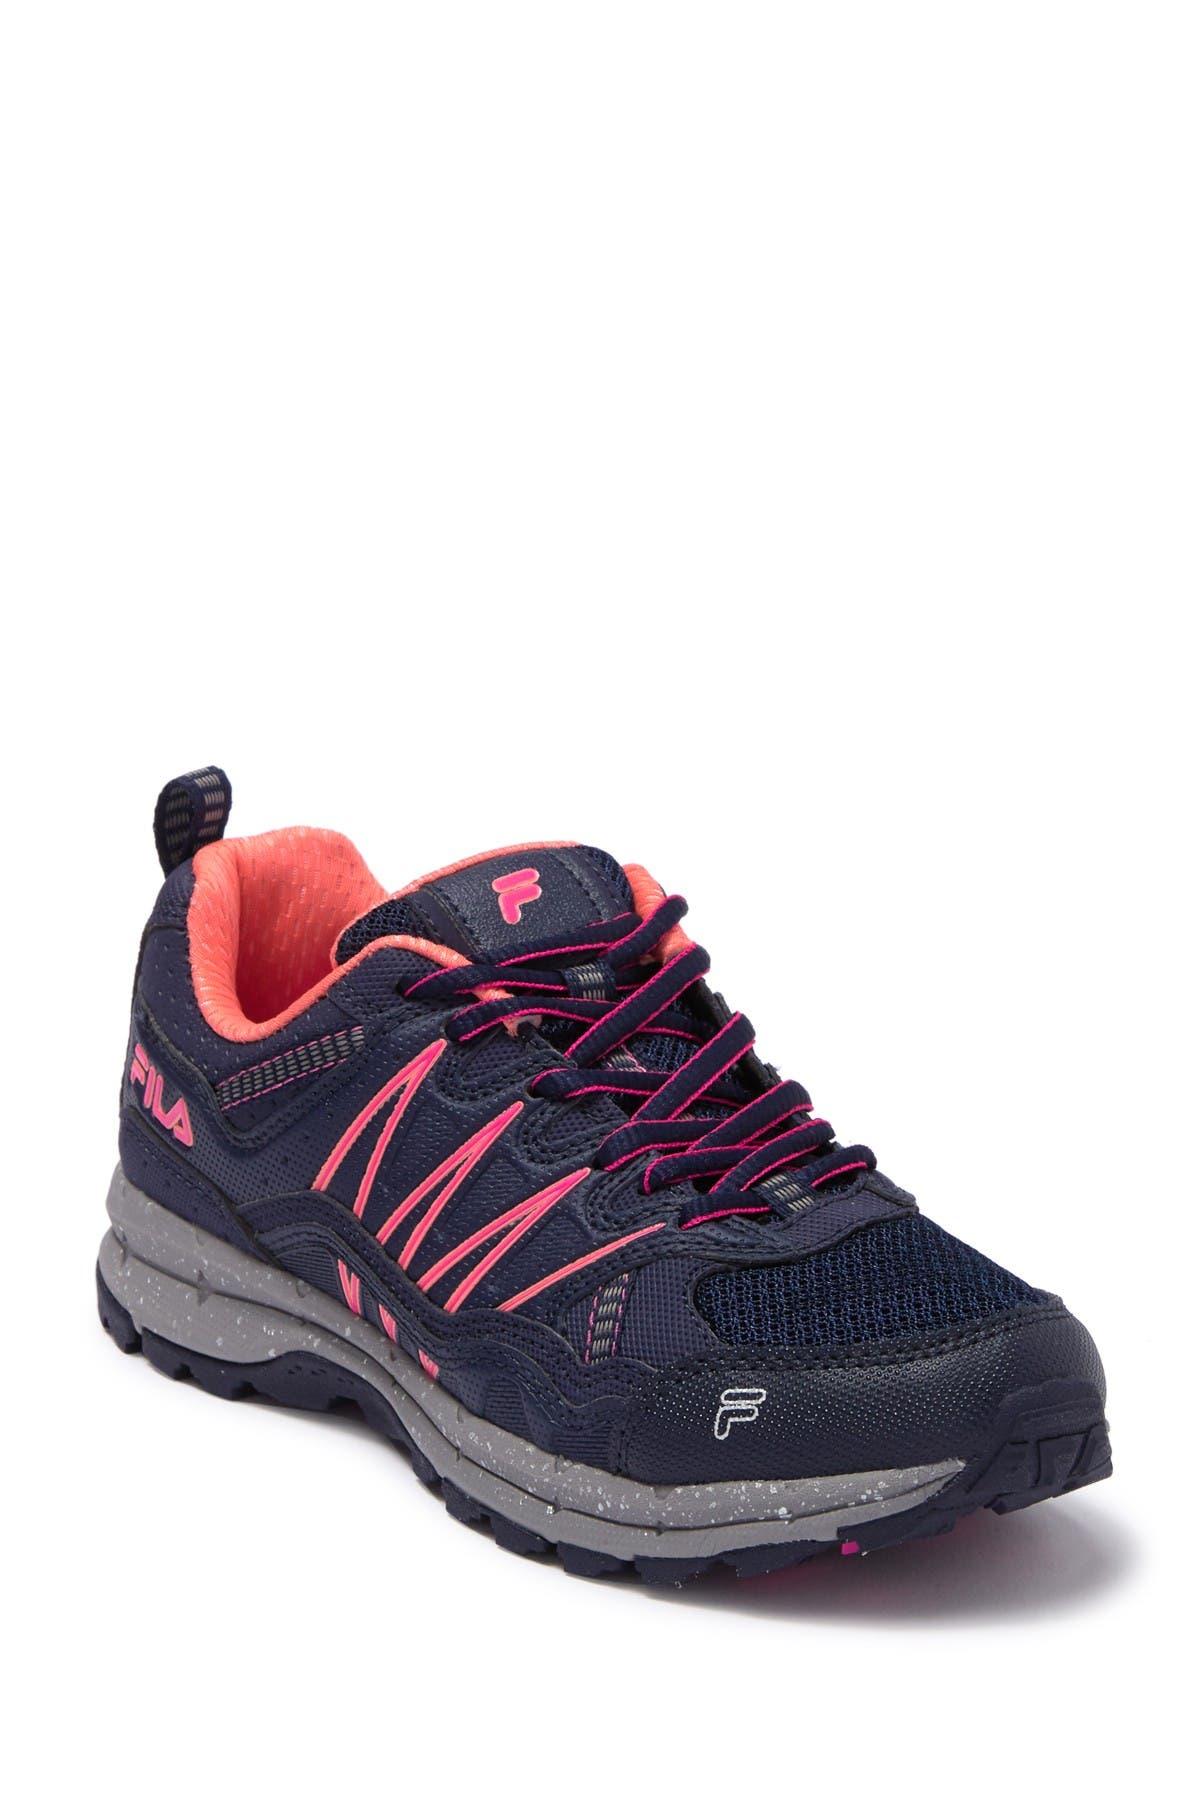 Image of FILA USA Evergrand Trail Running Shoe